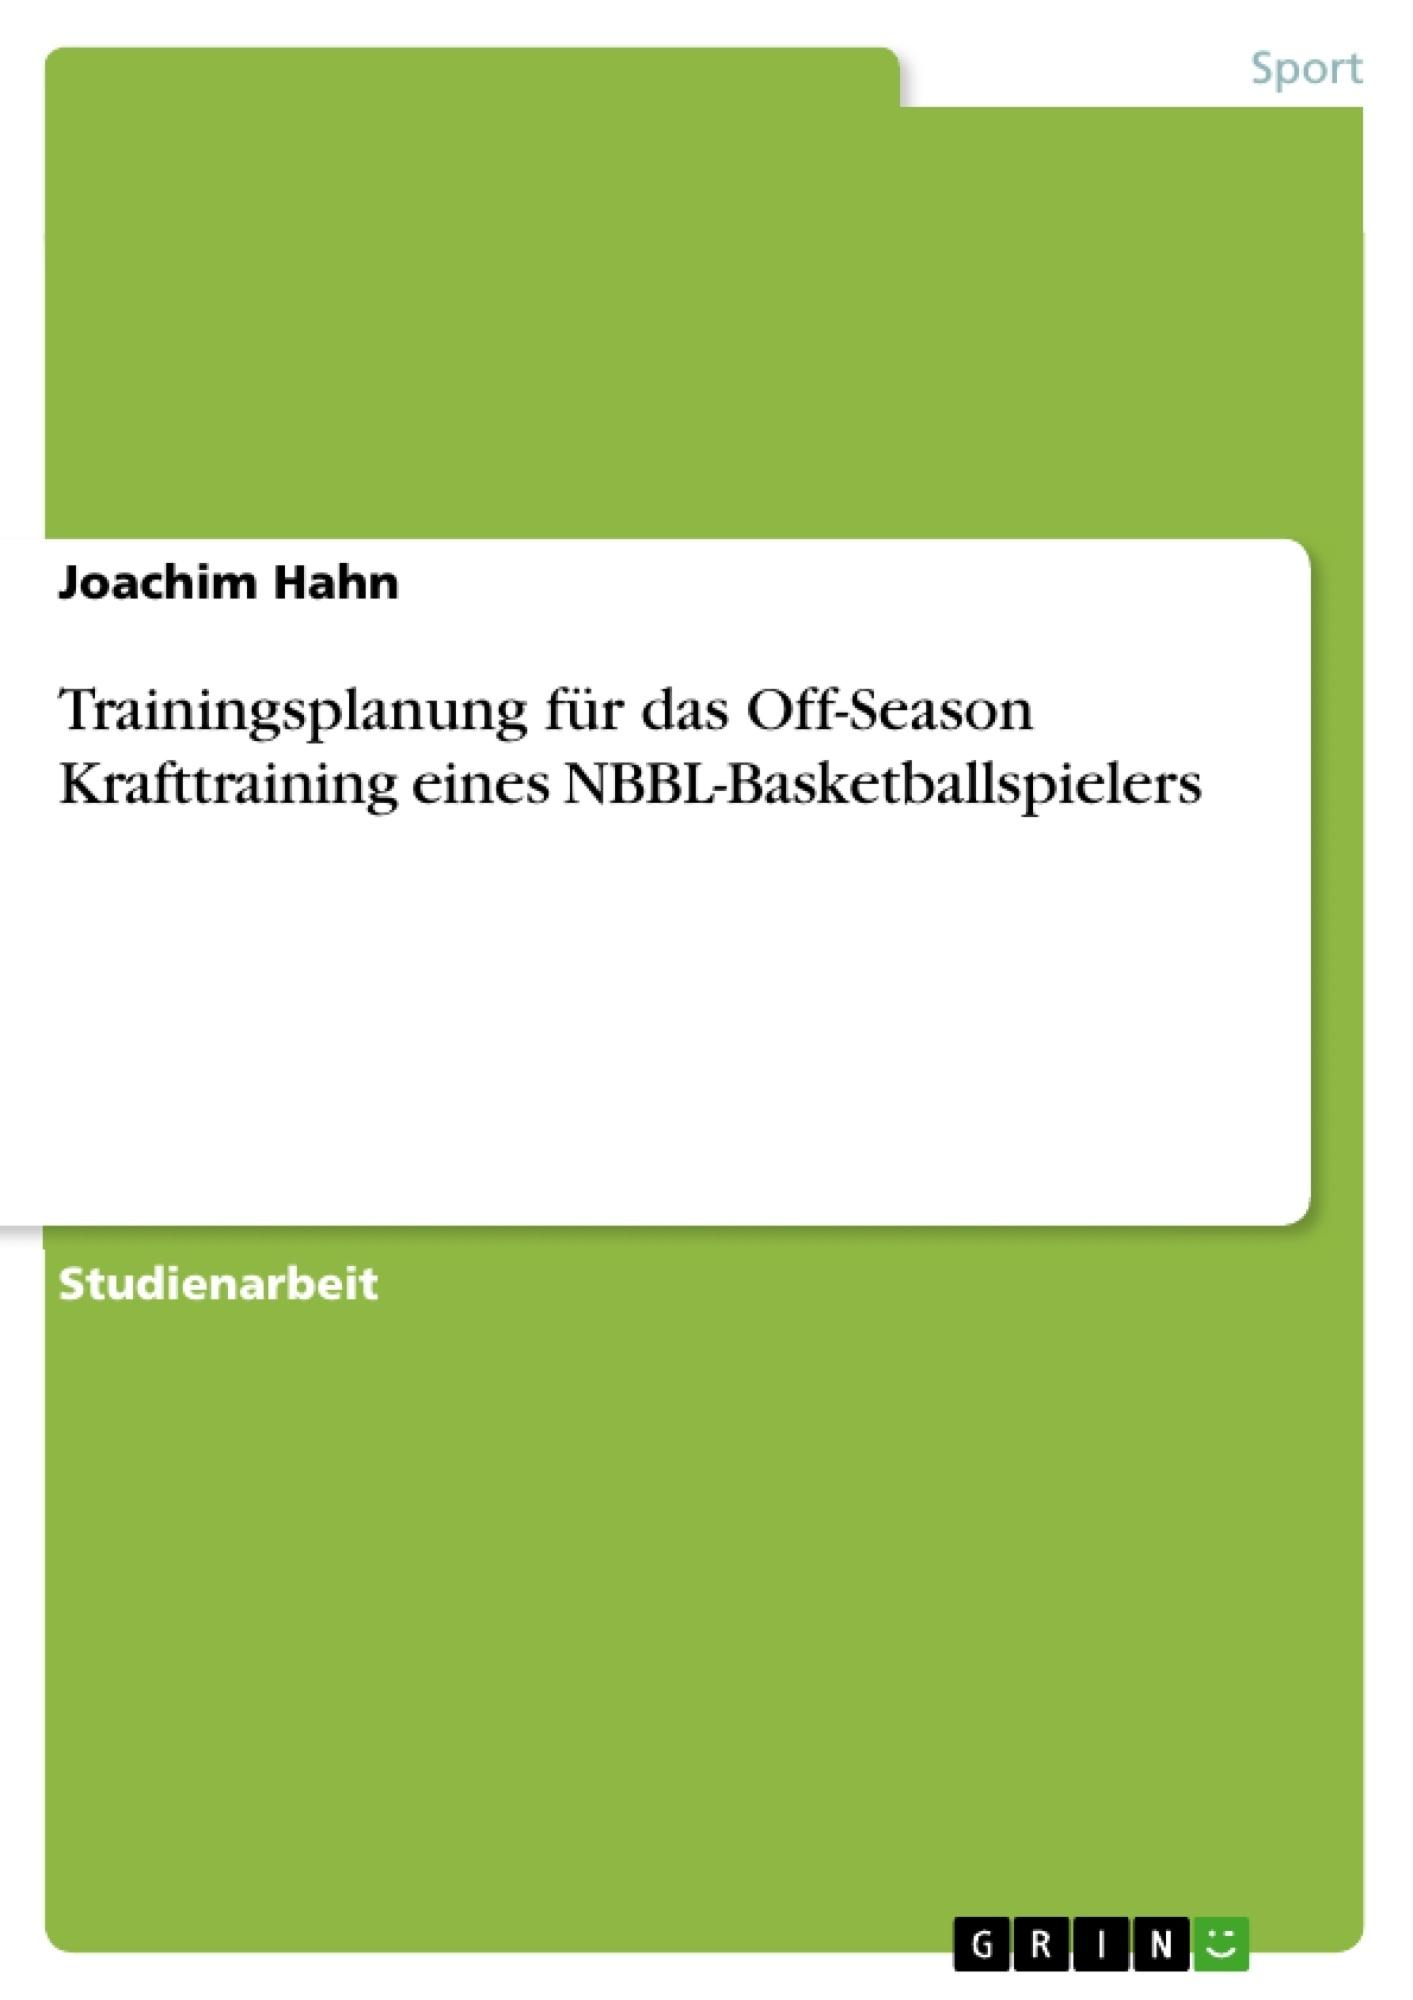 Titel: Trainingsplanung für das Off-Season Krafttraining eines NBBL-Basketballspielers